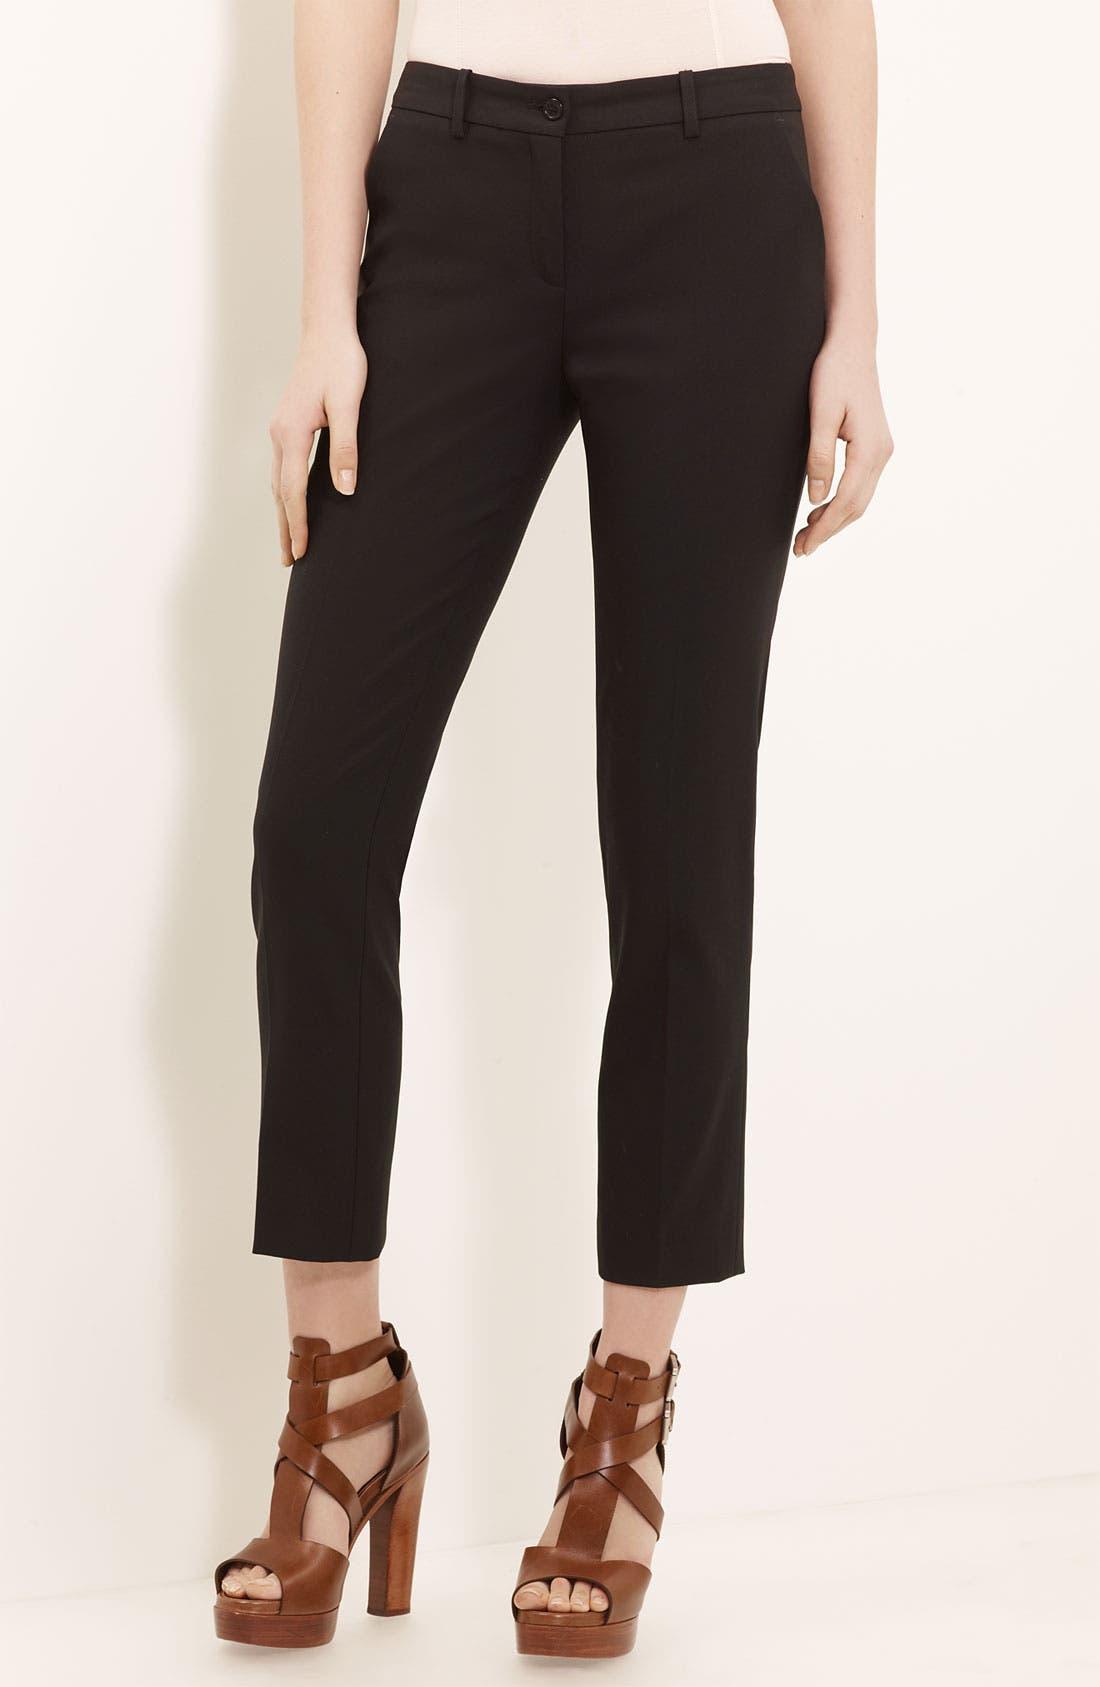 Alternate Image 1 Selected - Michael Kors 'Samantha' Skinny Pants